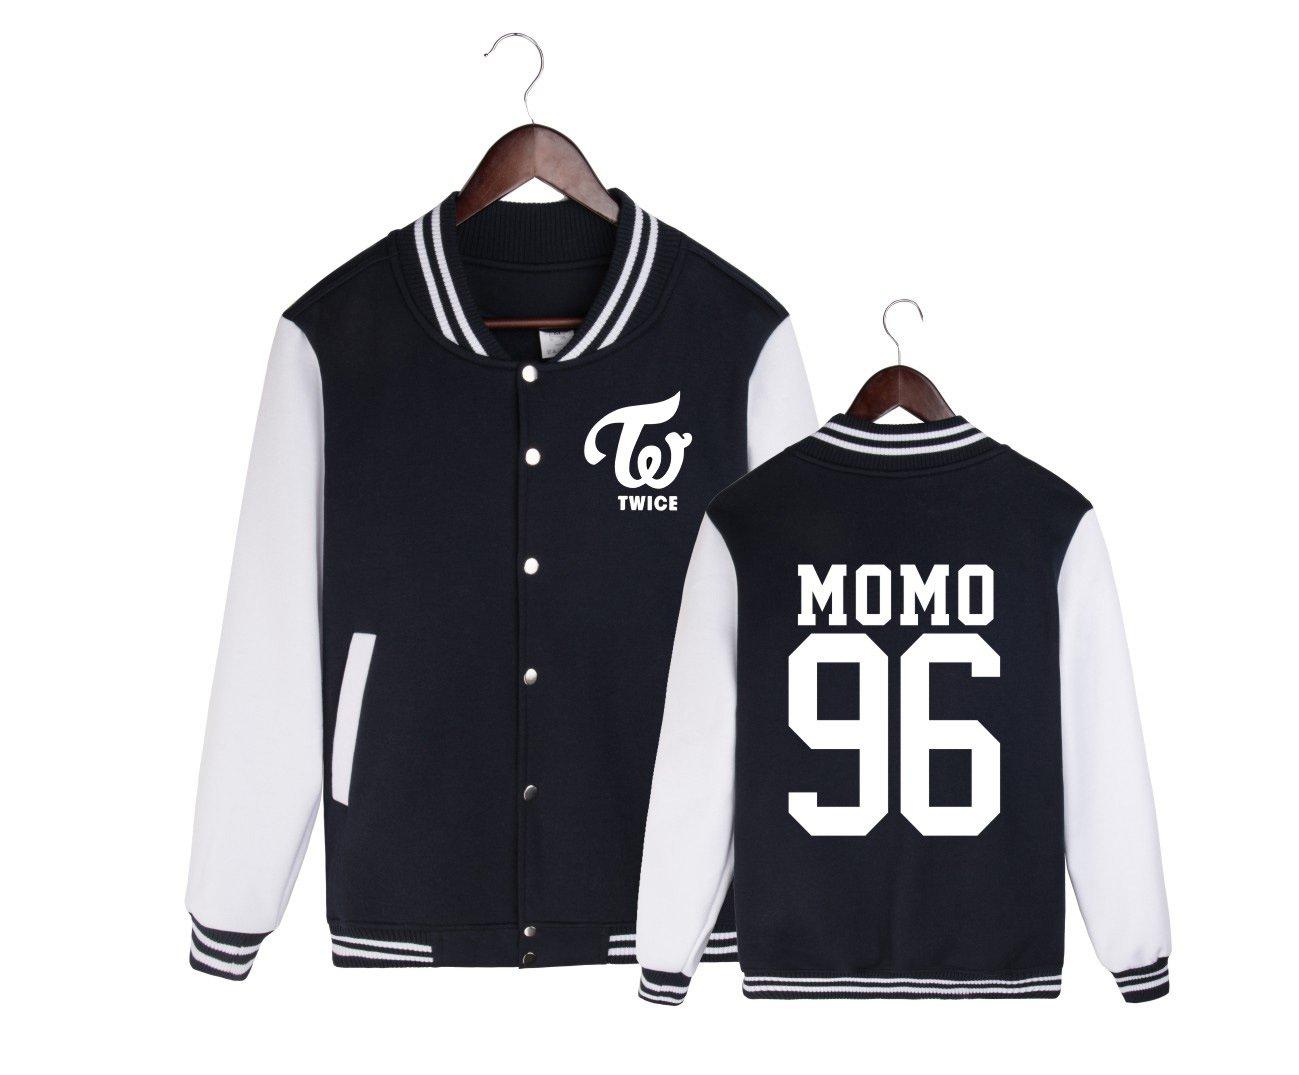 ALLDECOR Kpop Twice MOMO Long Sleeve Hoodie Jacket Coat Unisex Casual Baseball Uniform